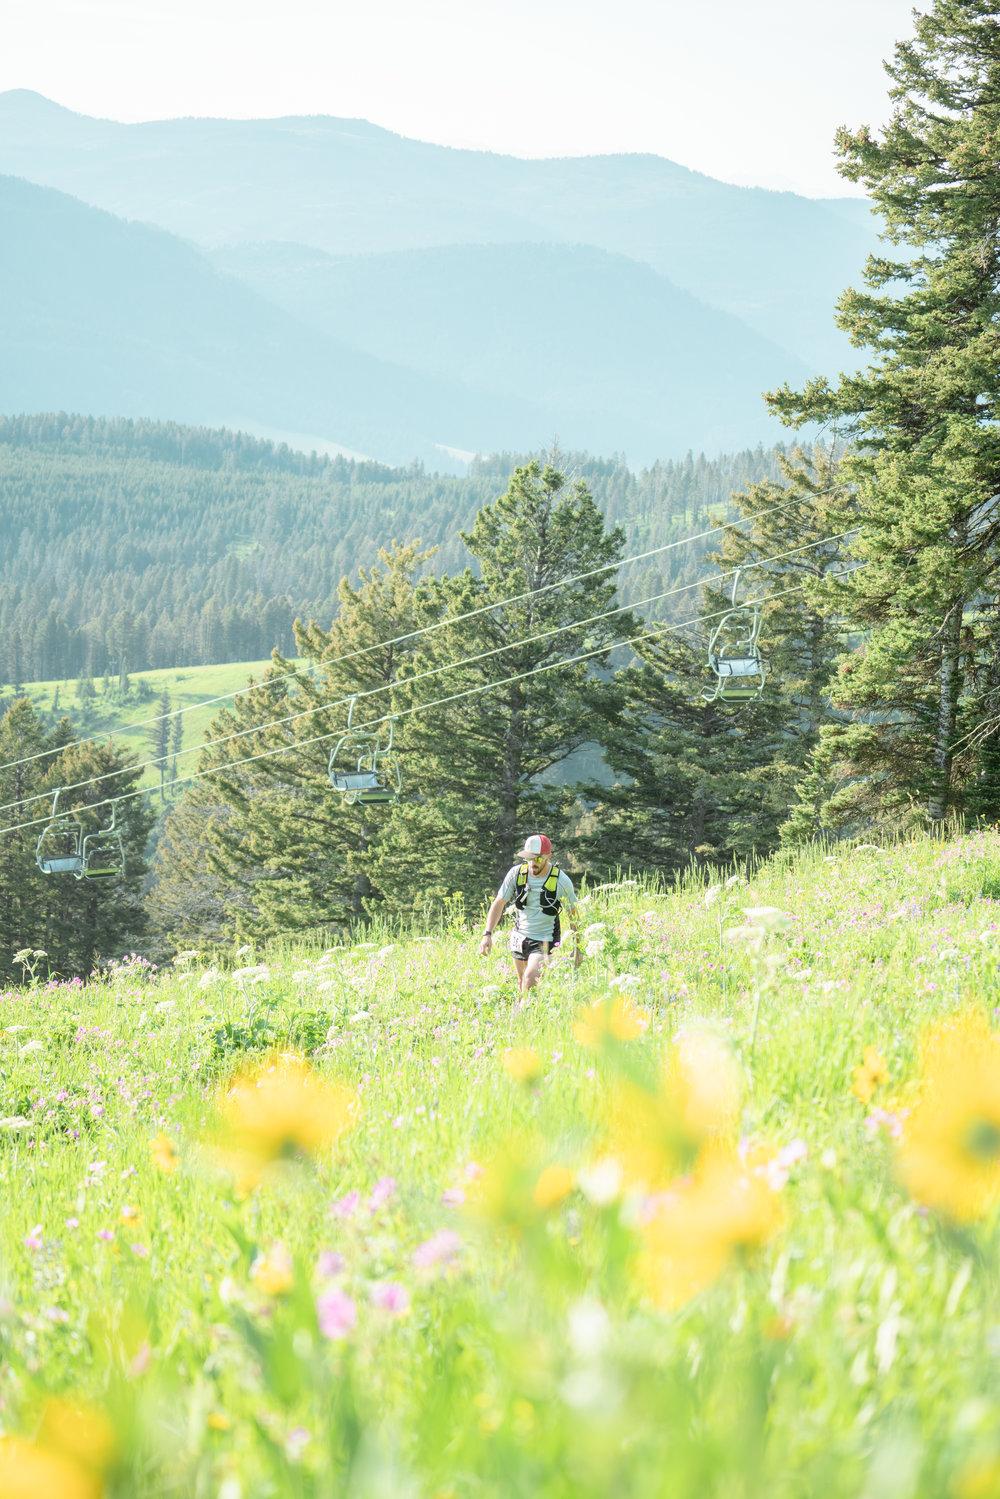 Runner at Bozeman Running Co. racing of Crosscuts at Bridger Bowl just north of Bozeman, Montana. Lots of wildflowers.